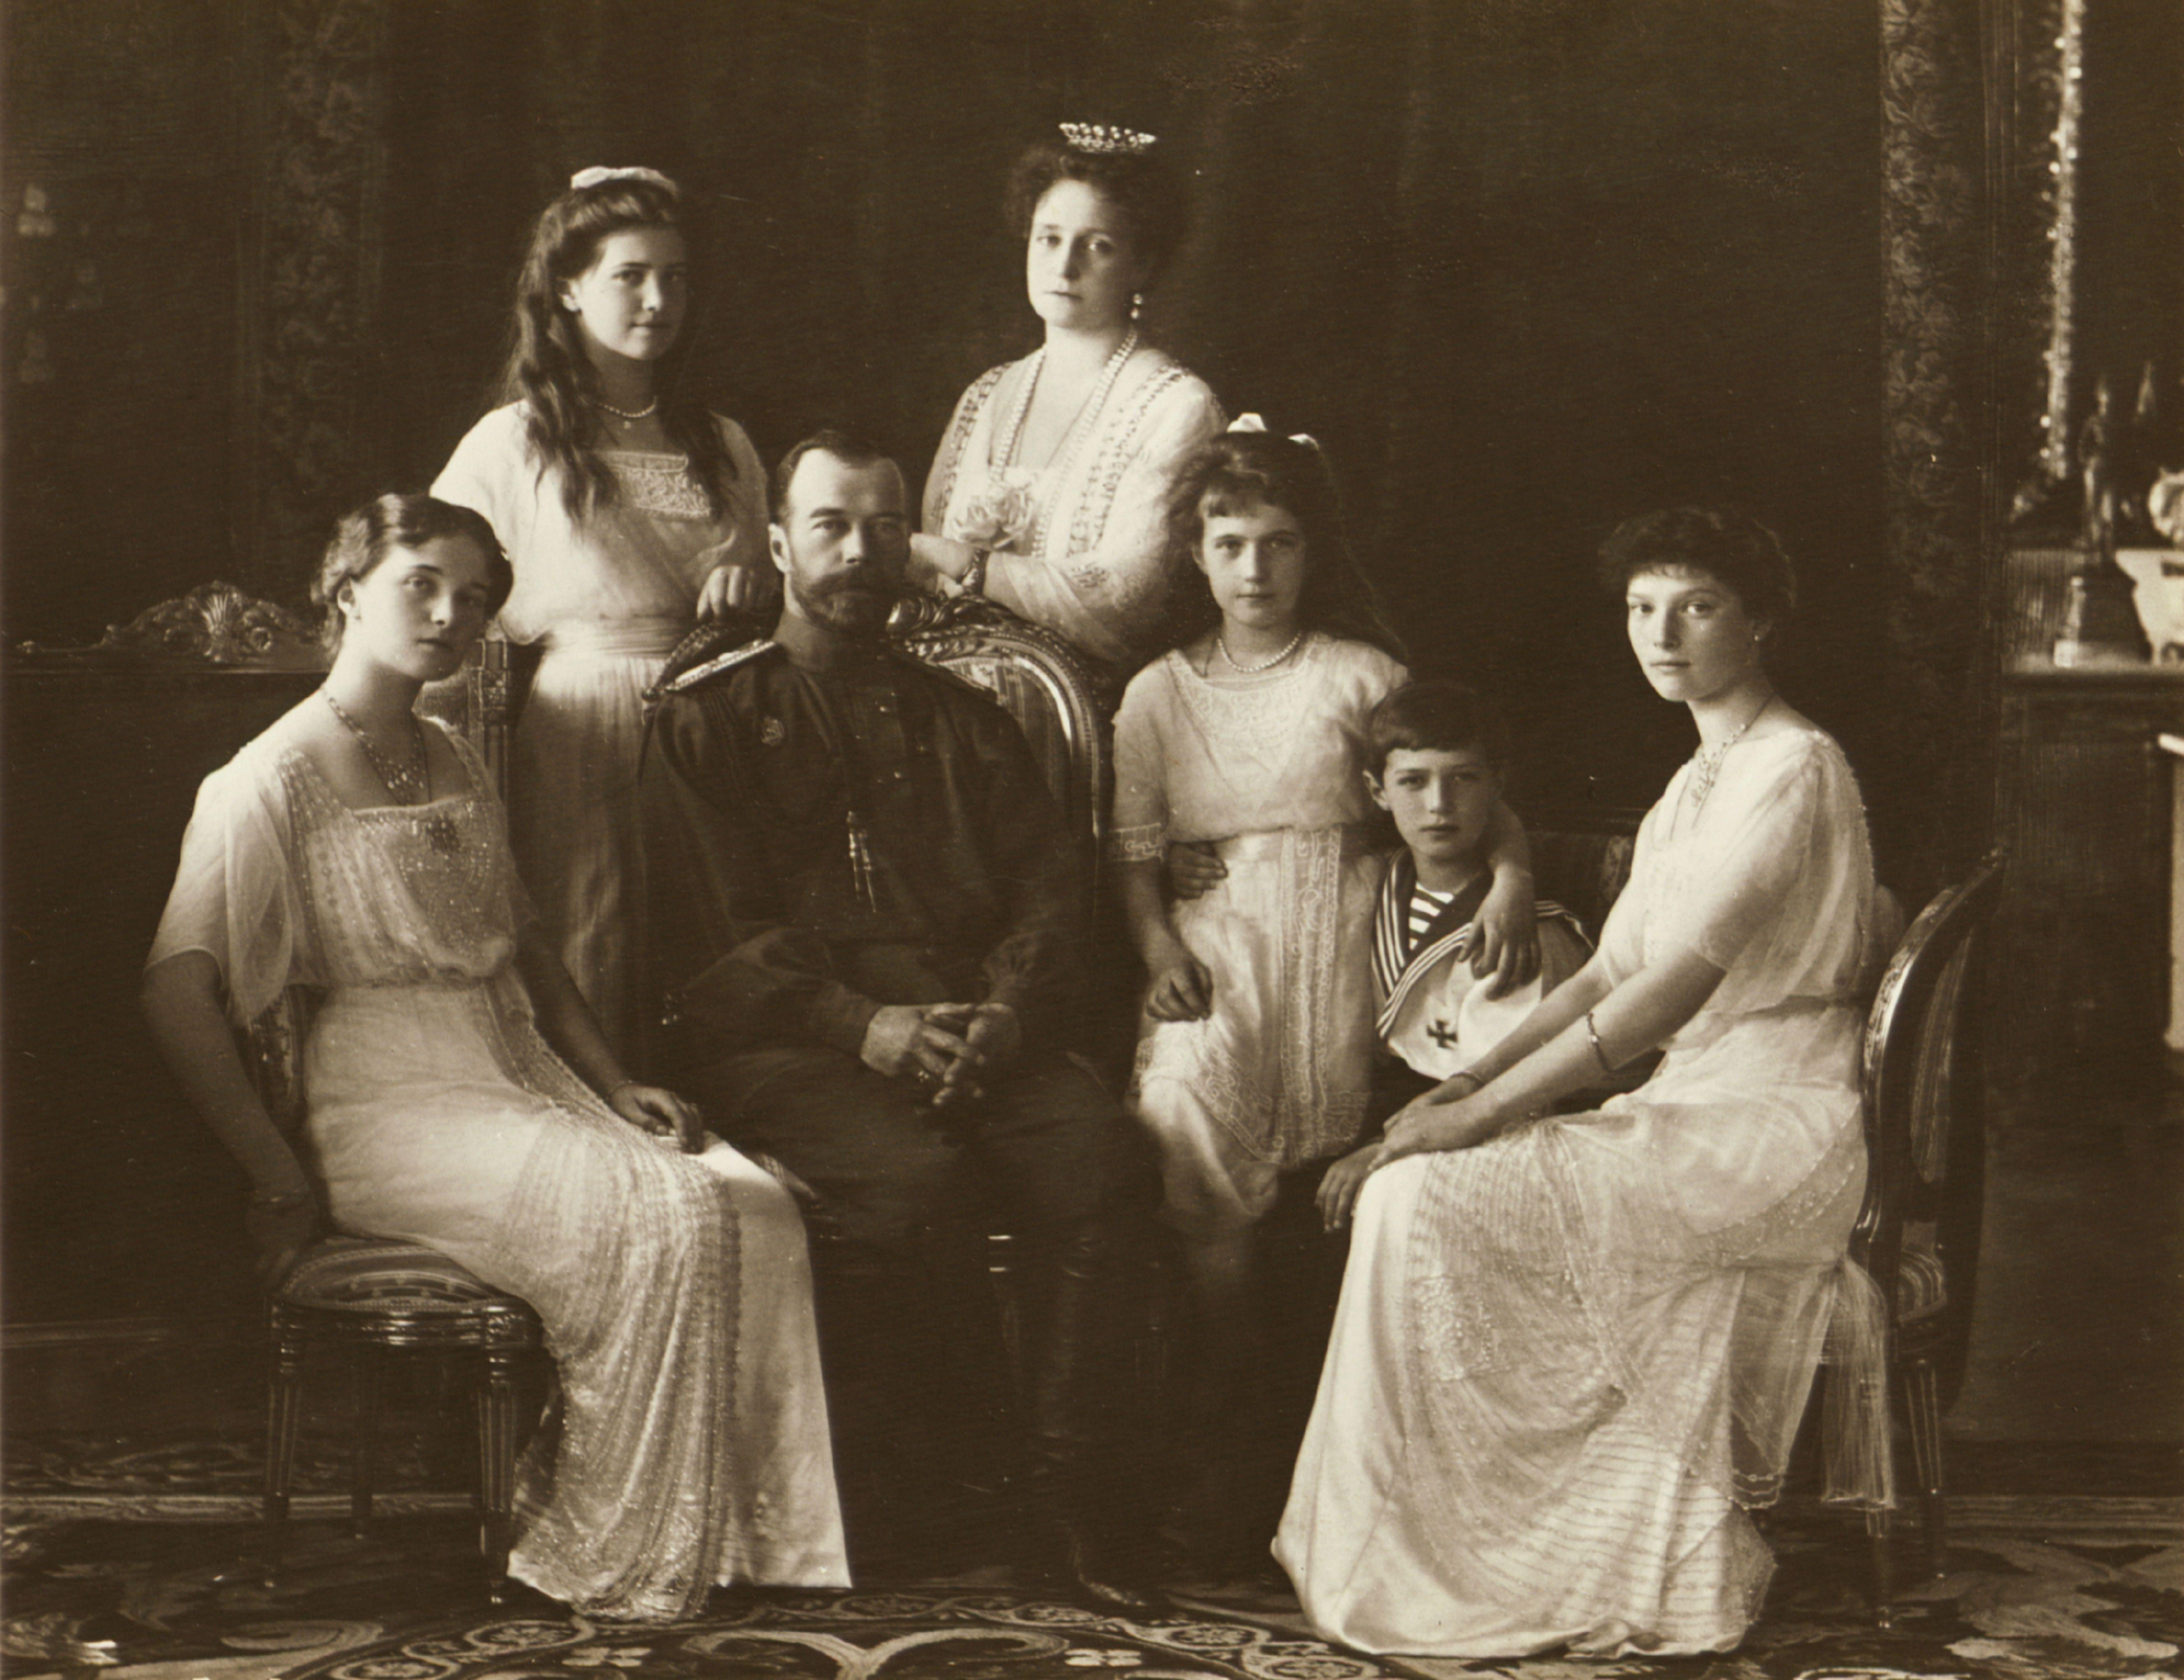 The True Story of 'The Last Czars' on Netflix - Romanov